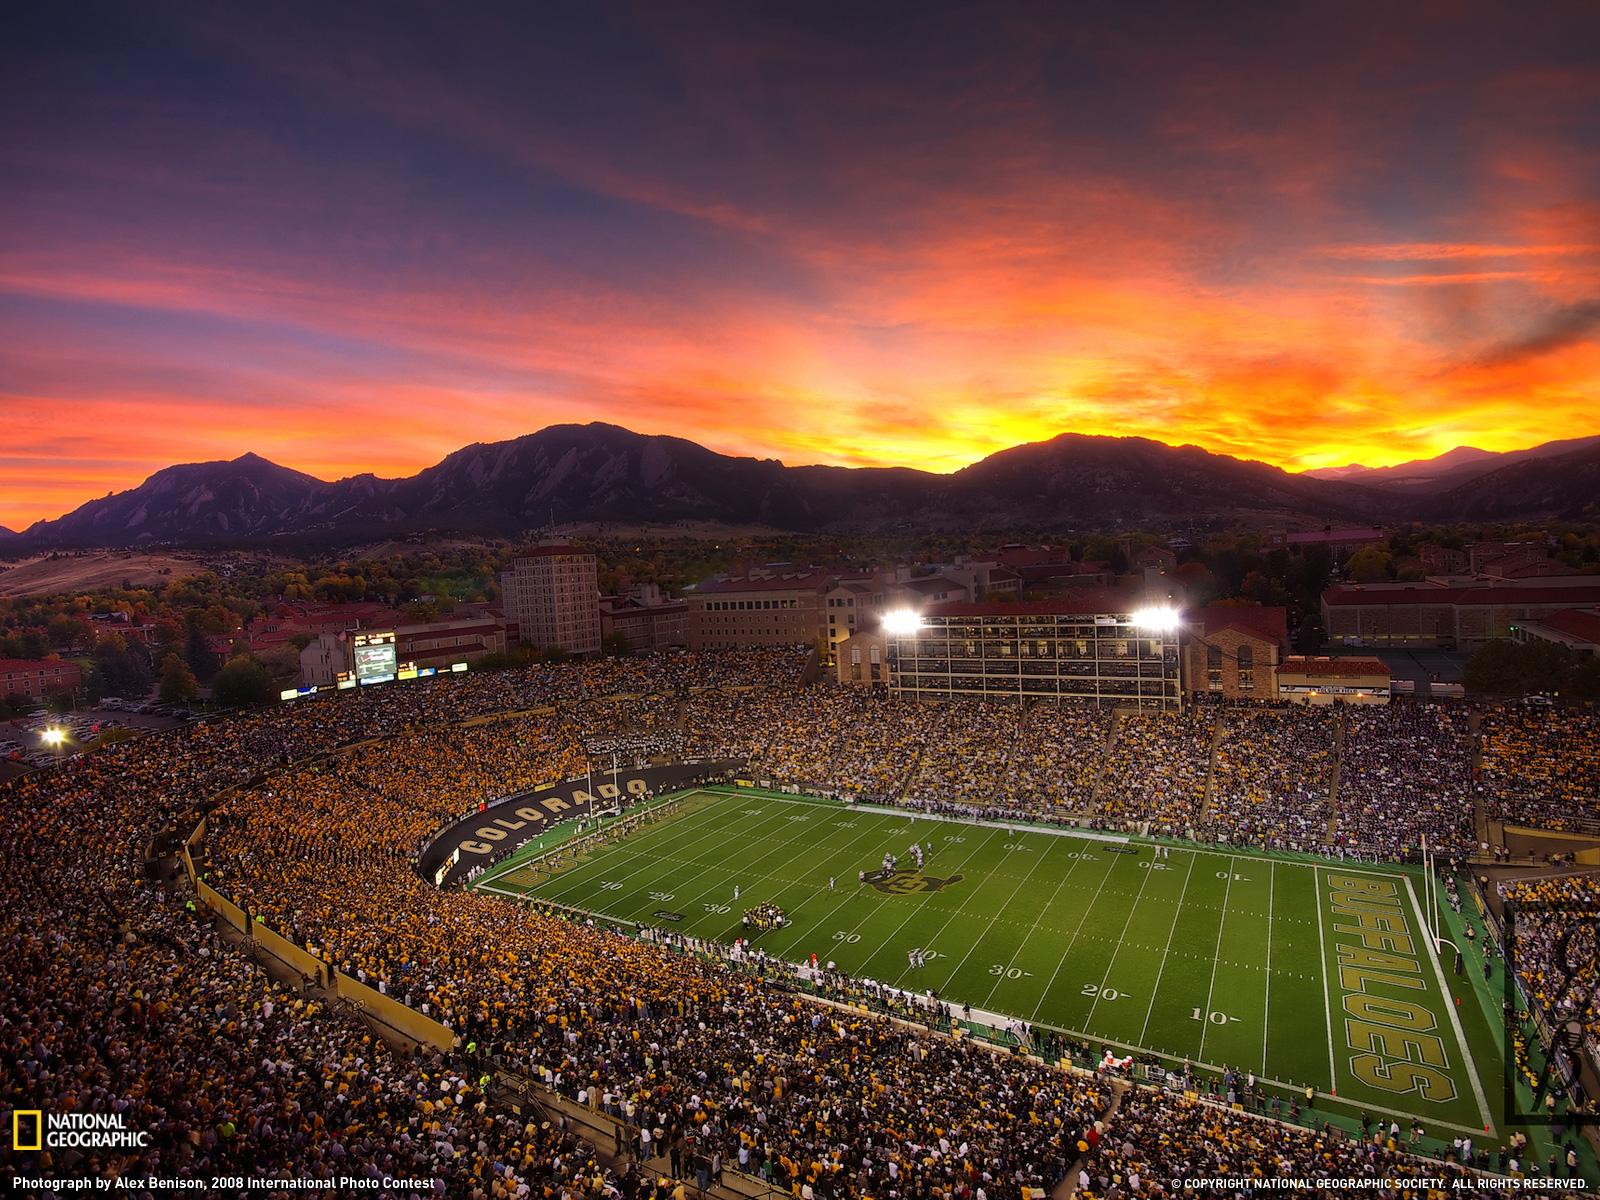 Football Stadium Photo Colorado Wallpaper   National Geographic Photo 1600x1200